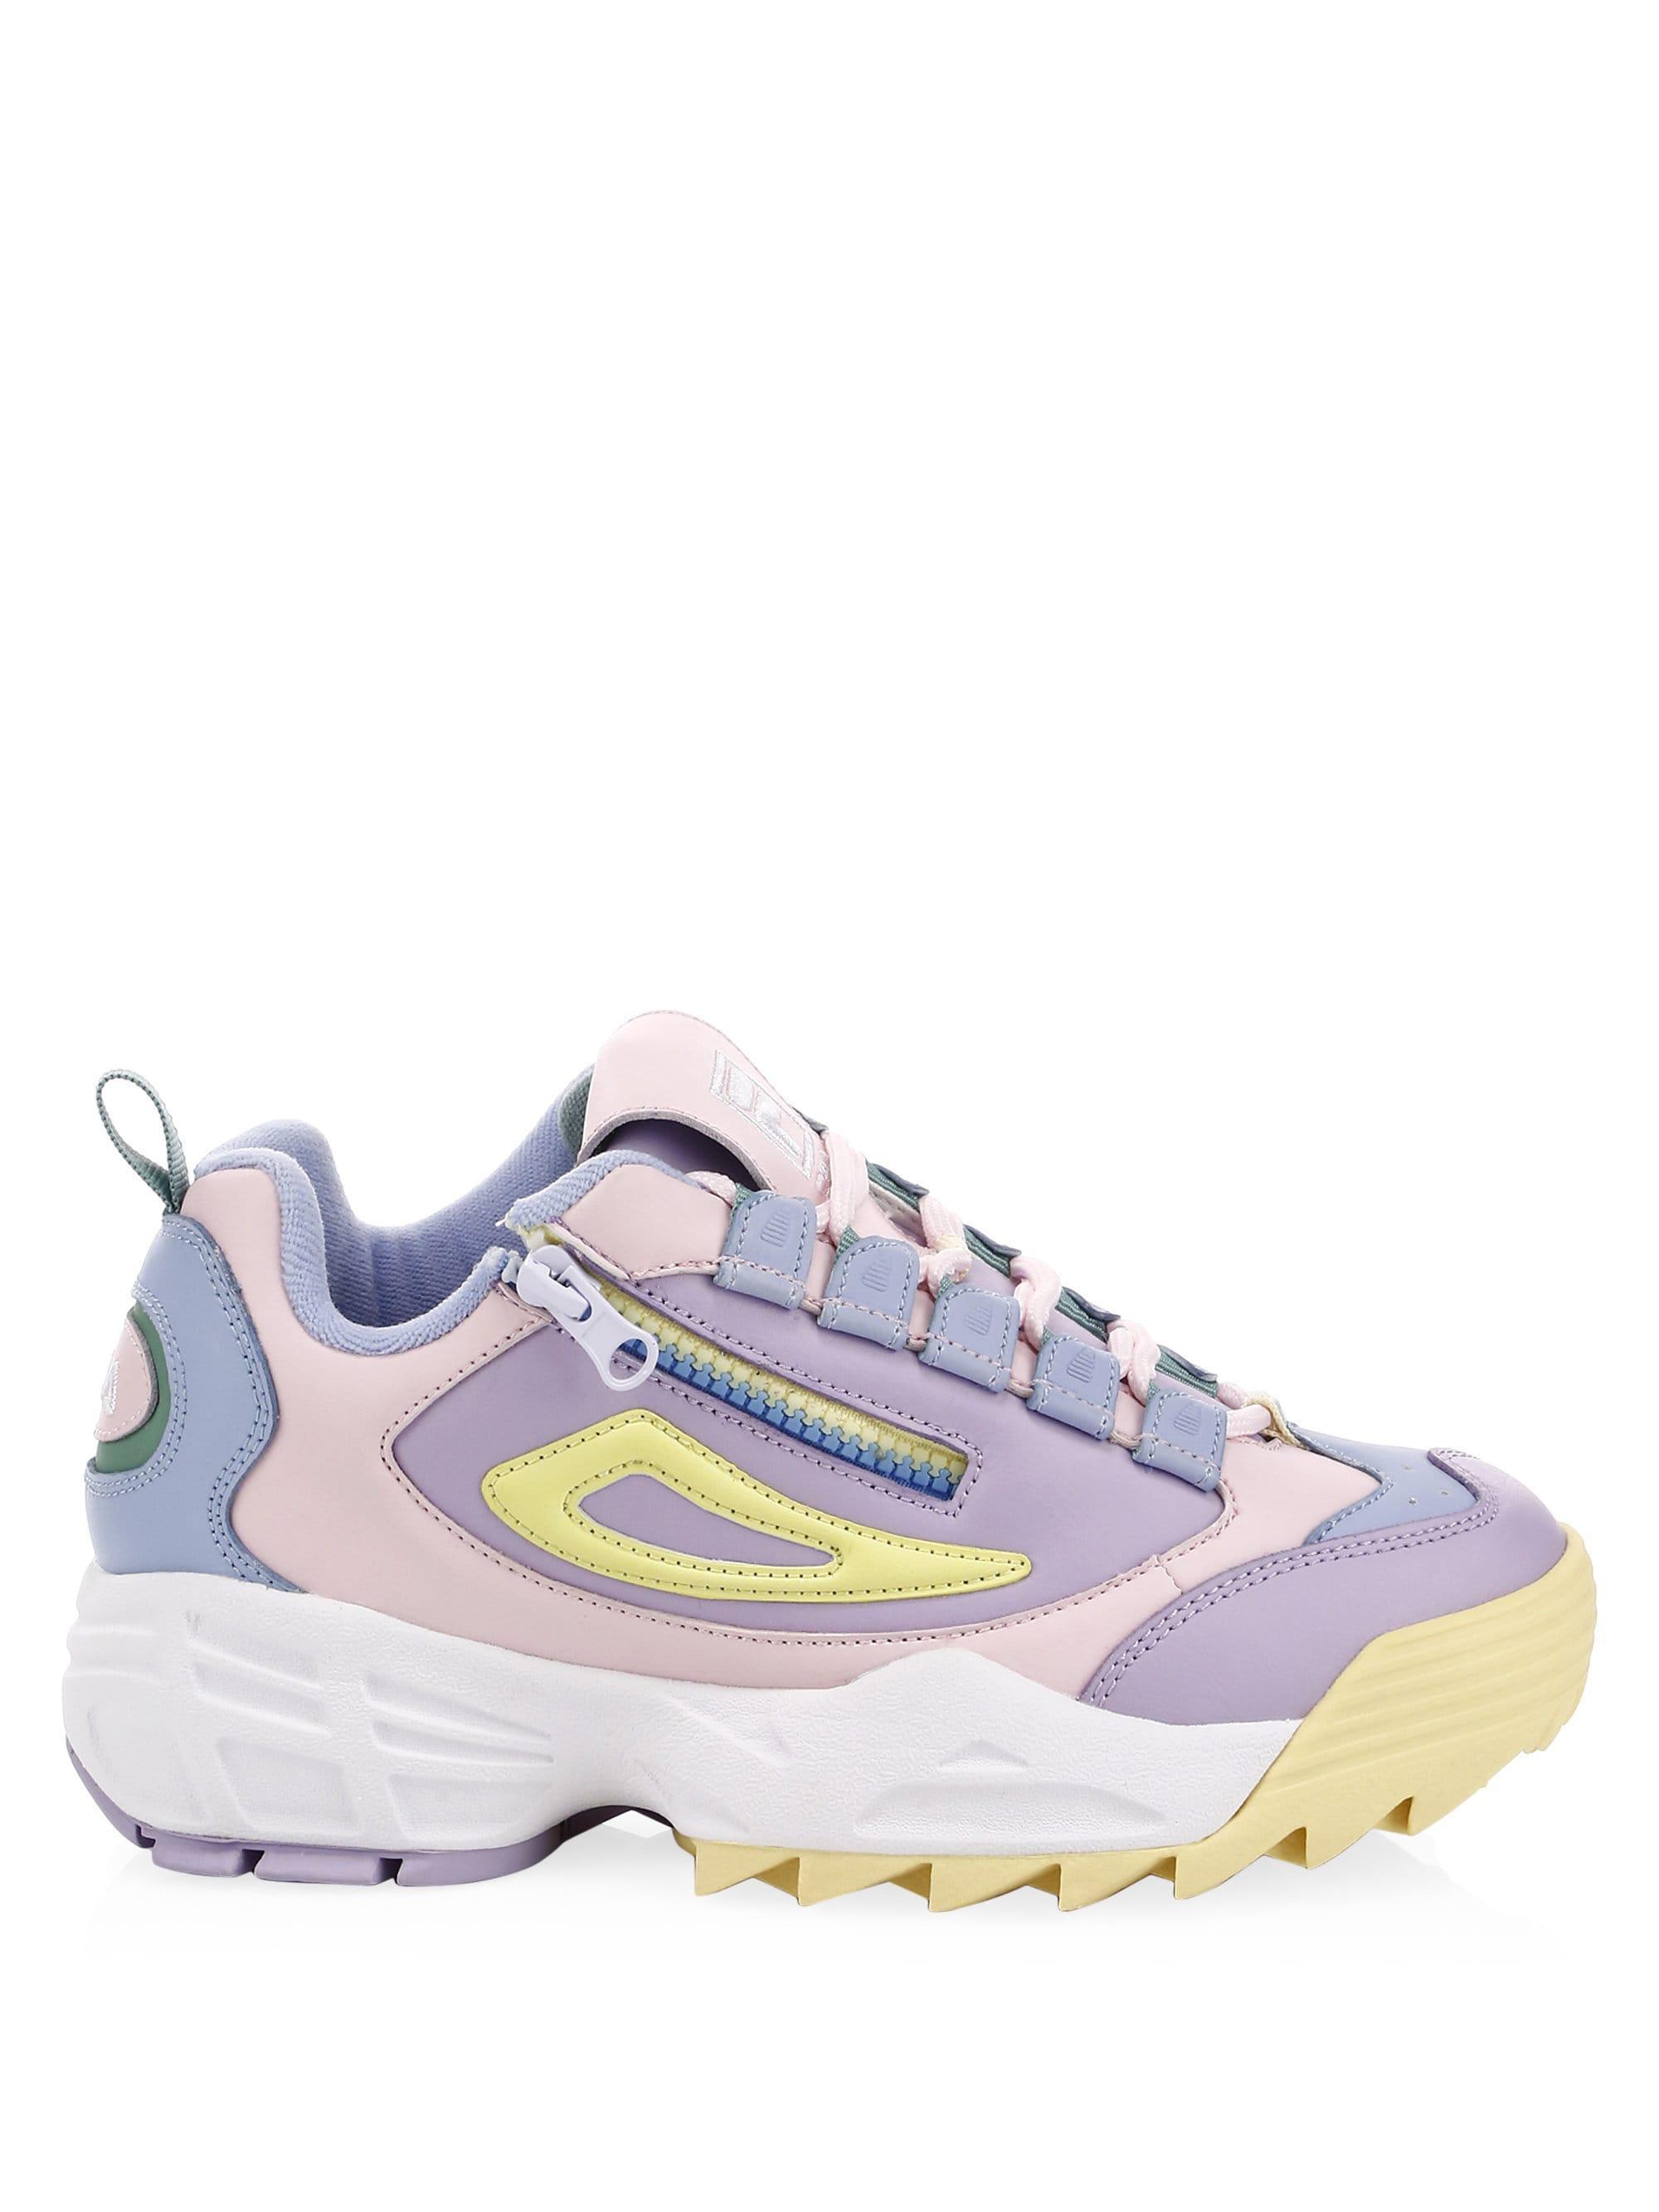 0a63675a1c5a Lyst - Fila Women s Disruptor Iii Zip Leather Sneakers